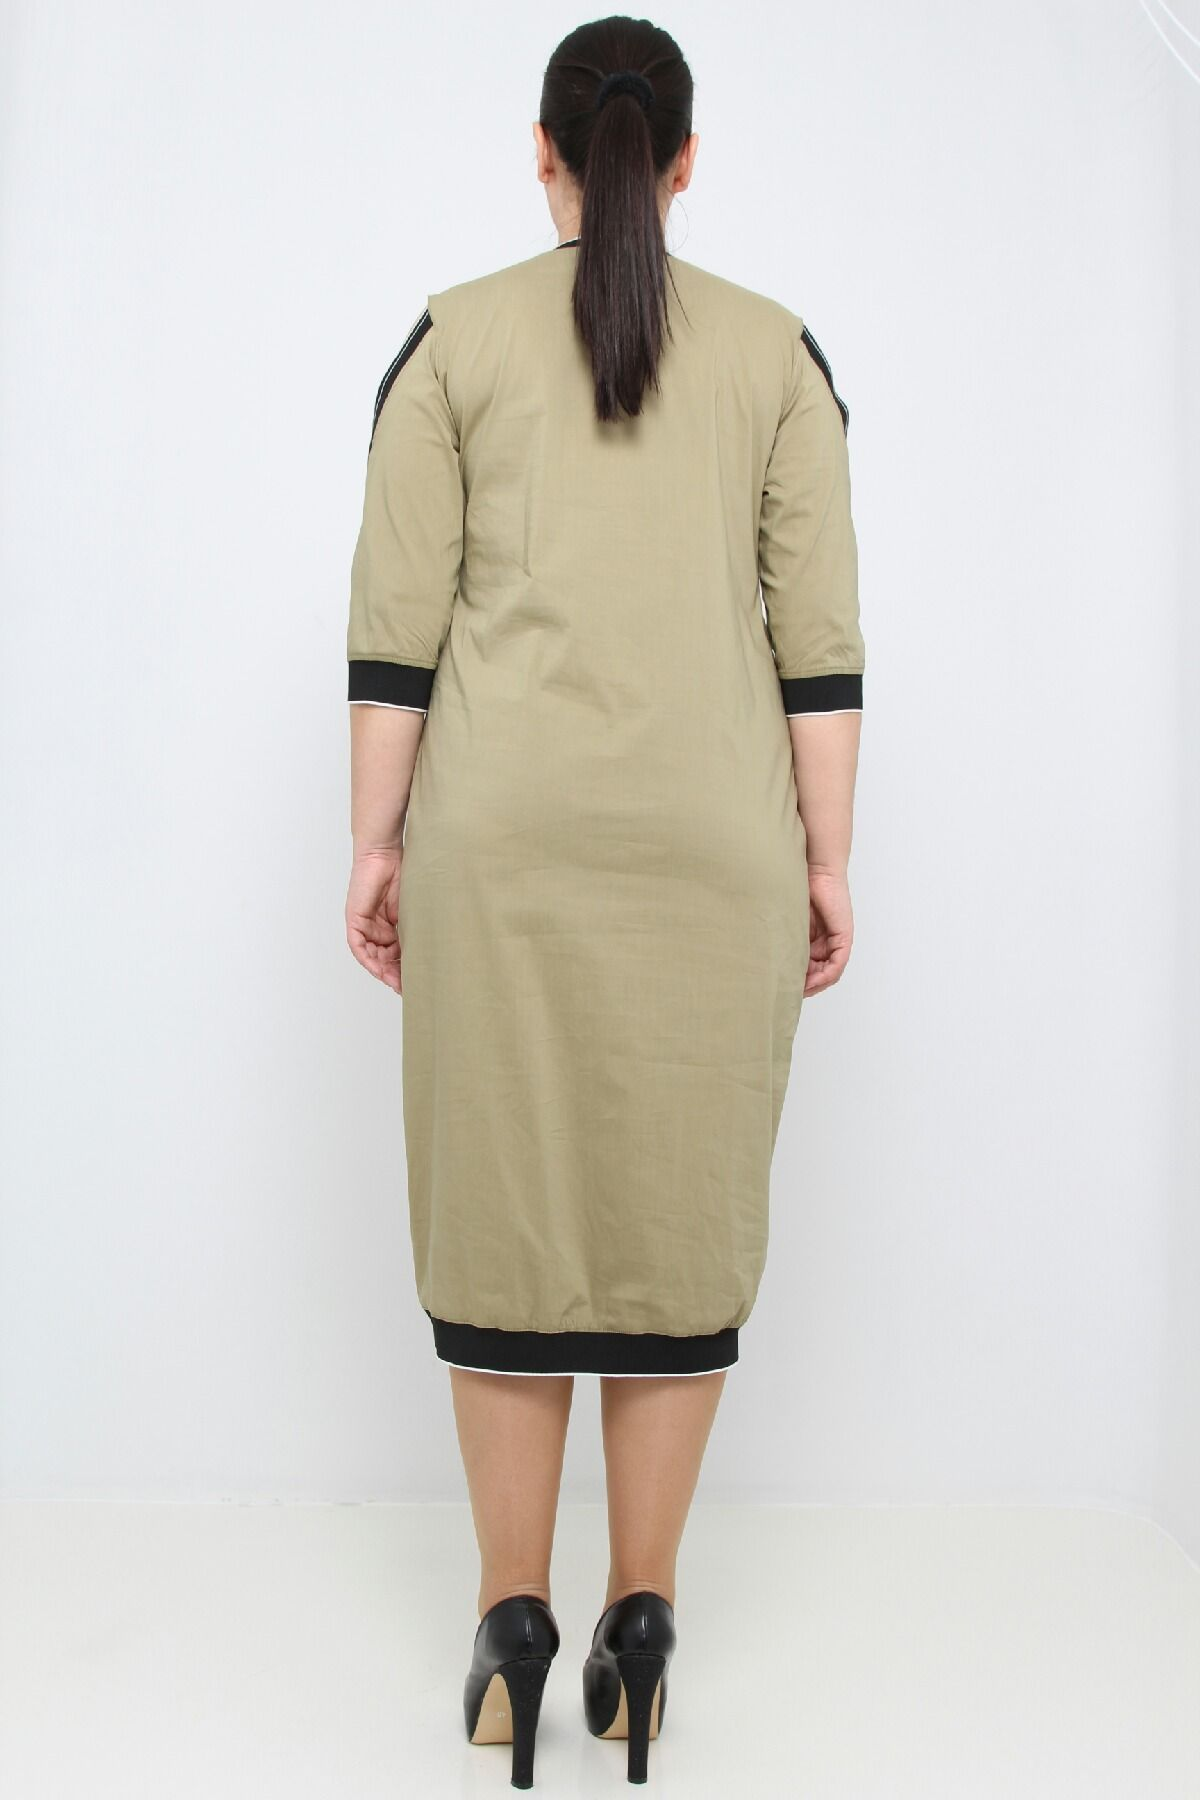 Day Dresses Medium-olive-drab